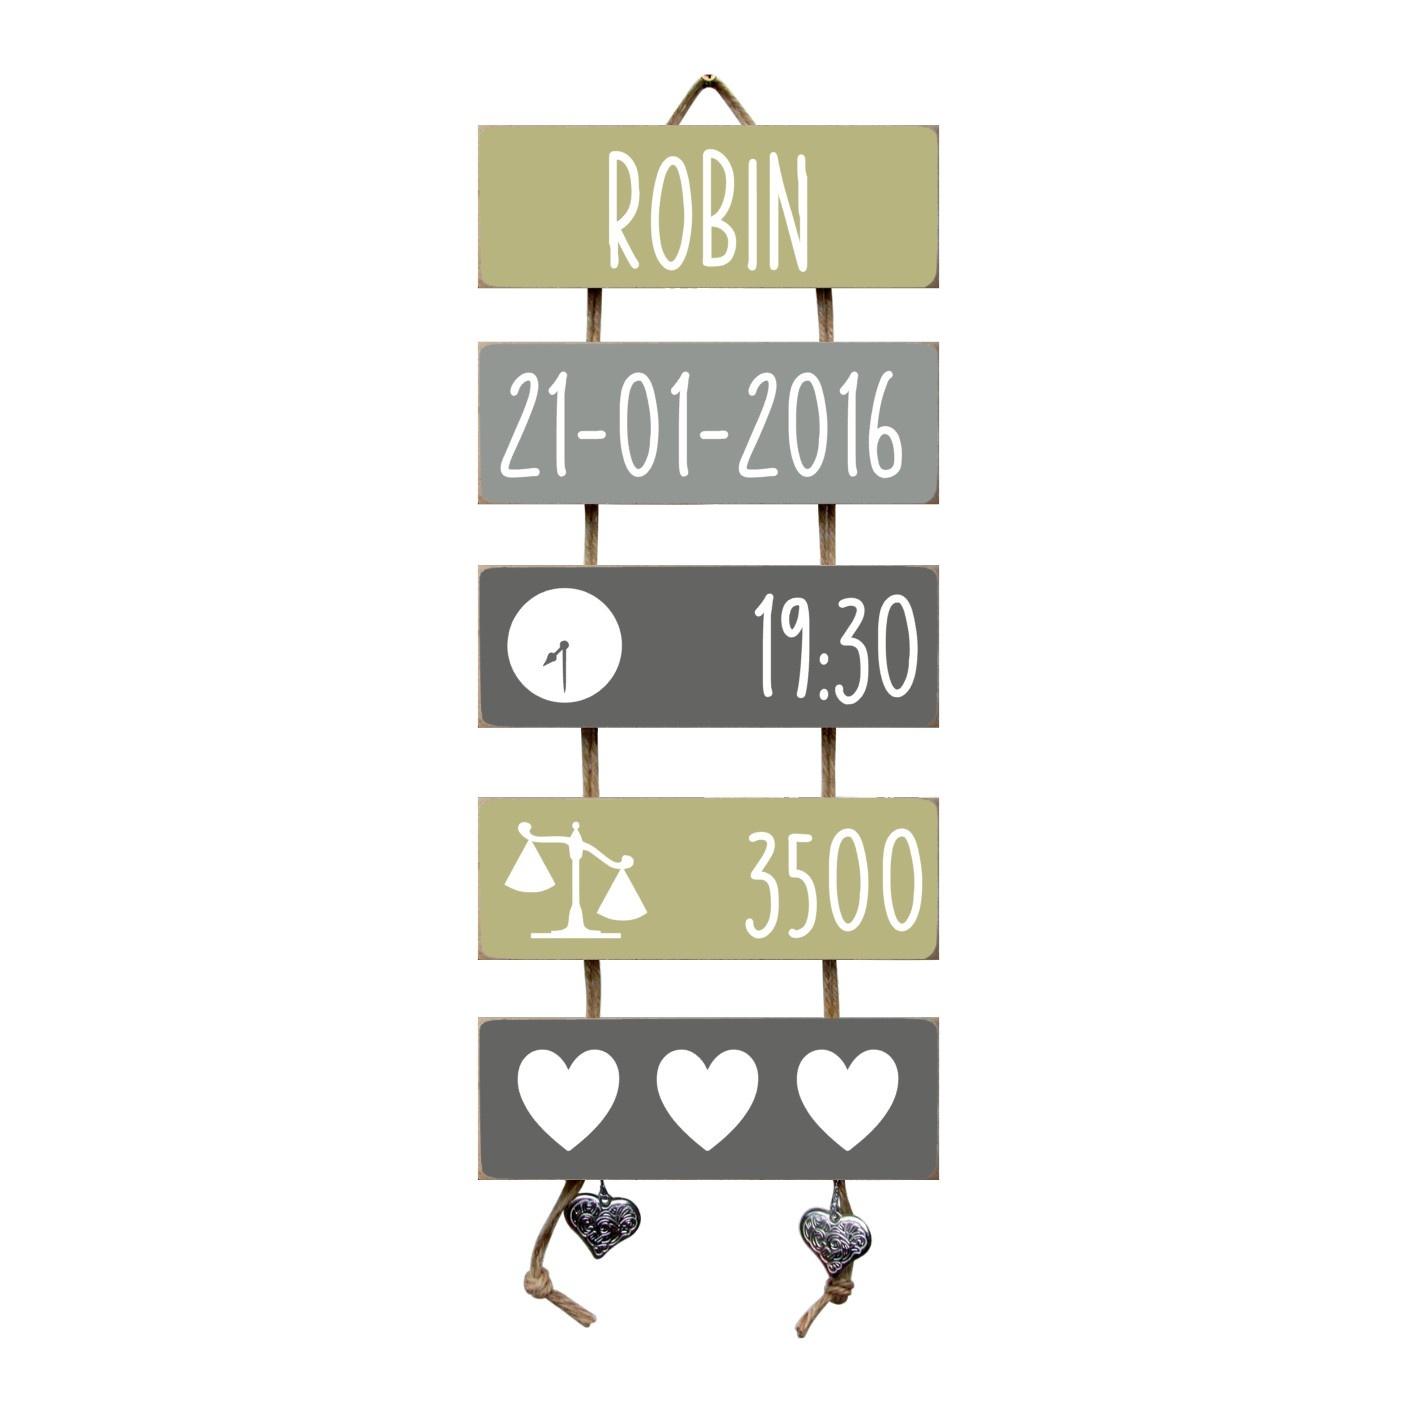 Kraamcadeau Geboorteladder Robin Olive Tree/grijs